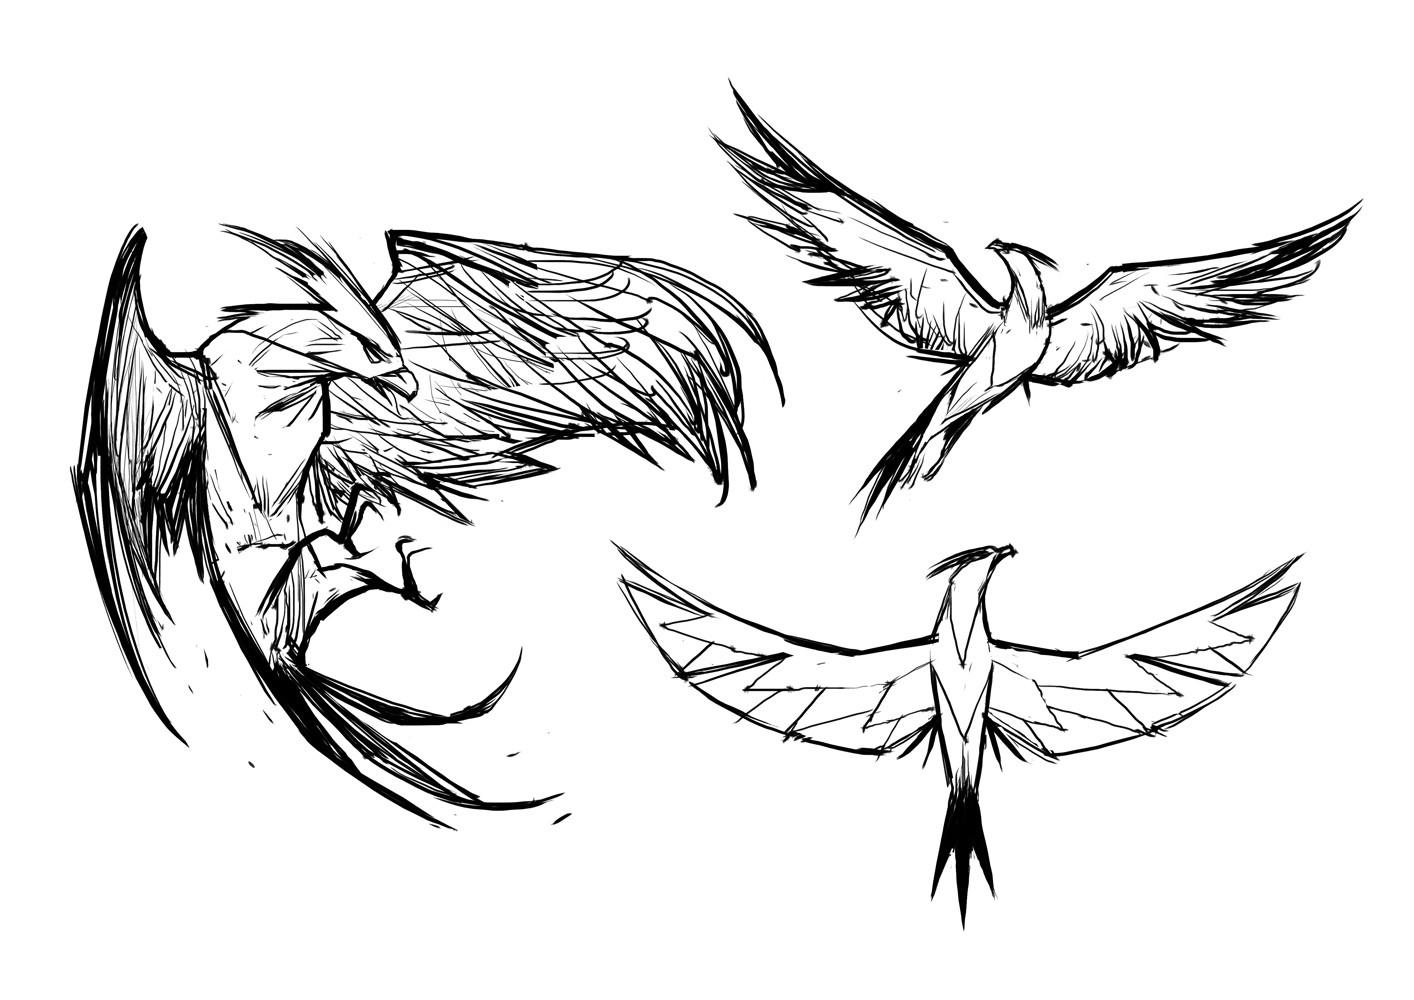 Renaud roche rgt phoenix rough web